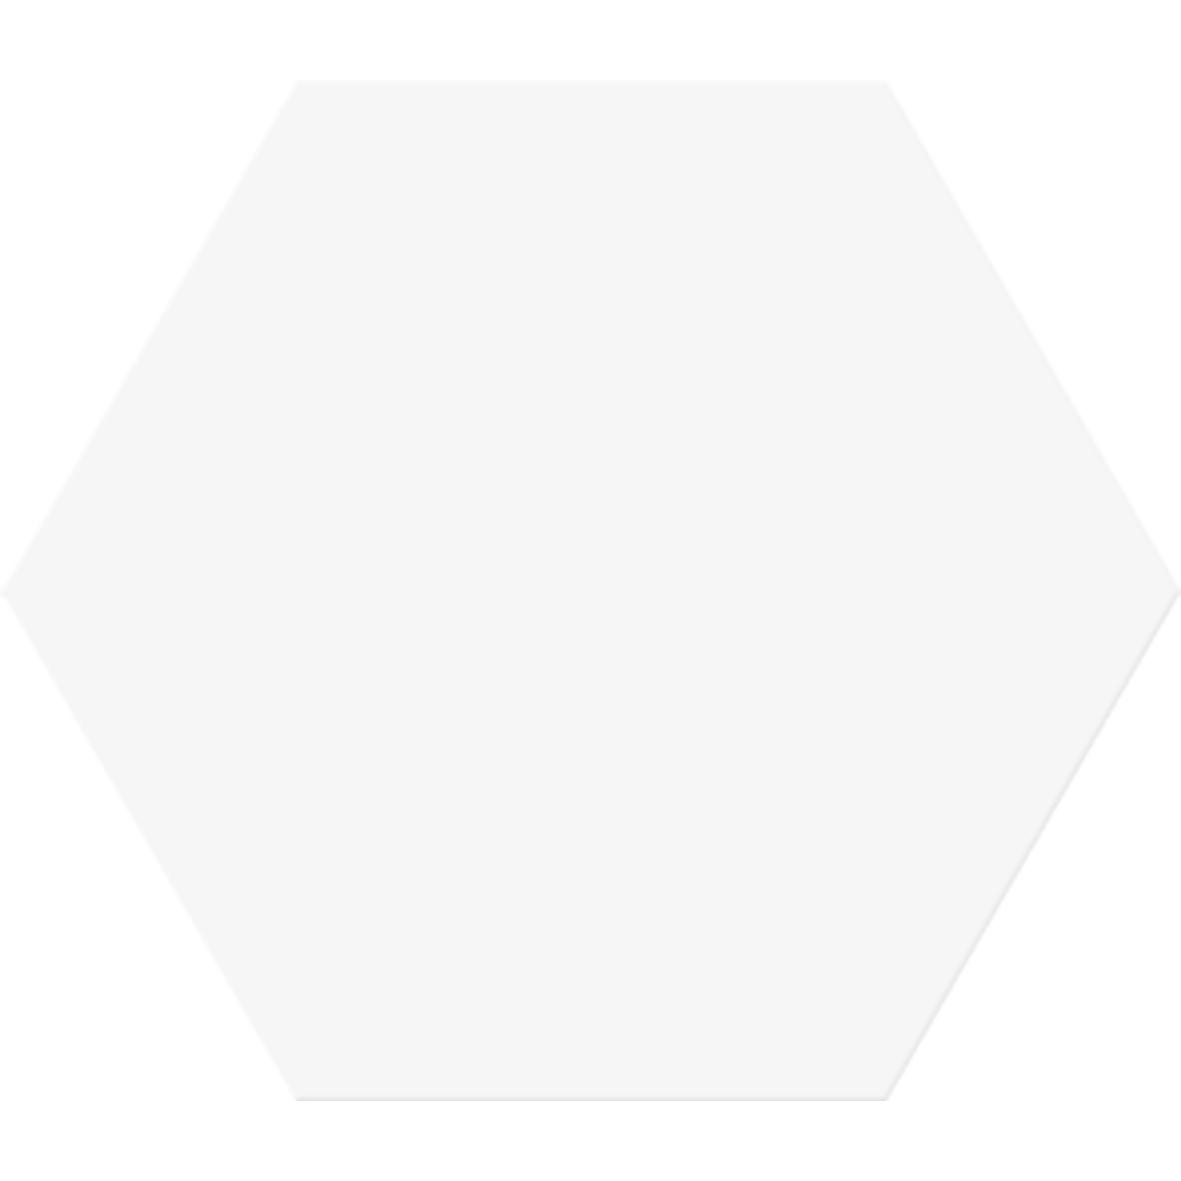 K94526100001VTE0, Miniworx, Valkoinen, lattia